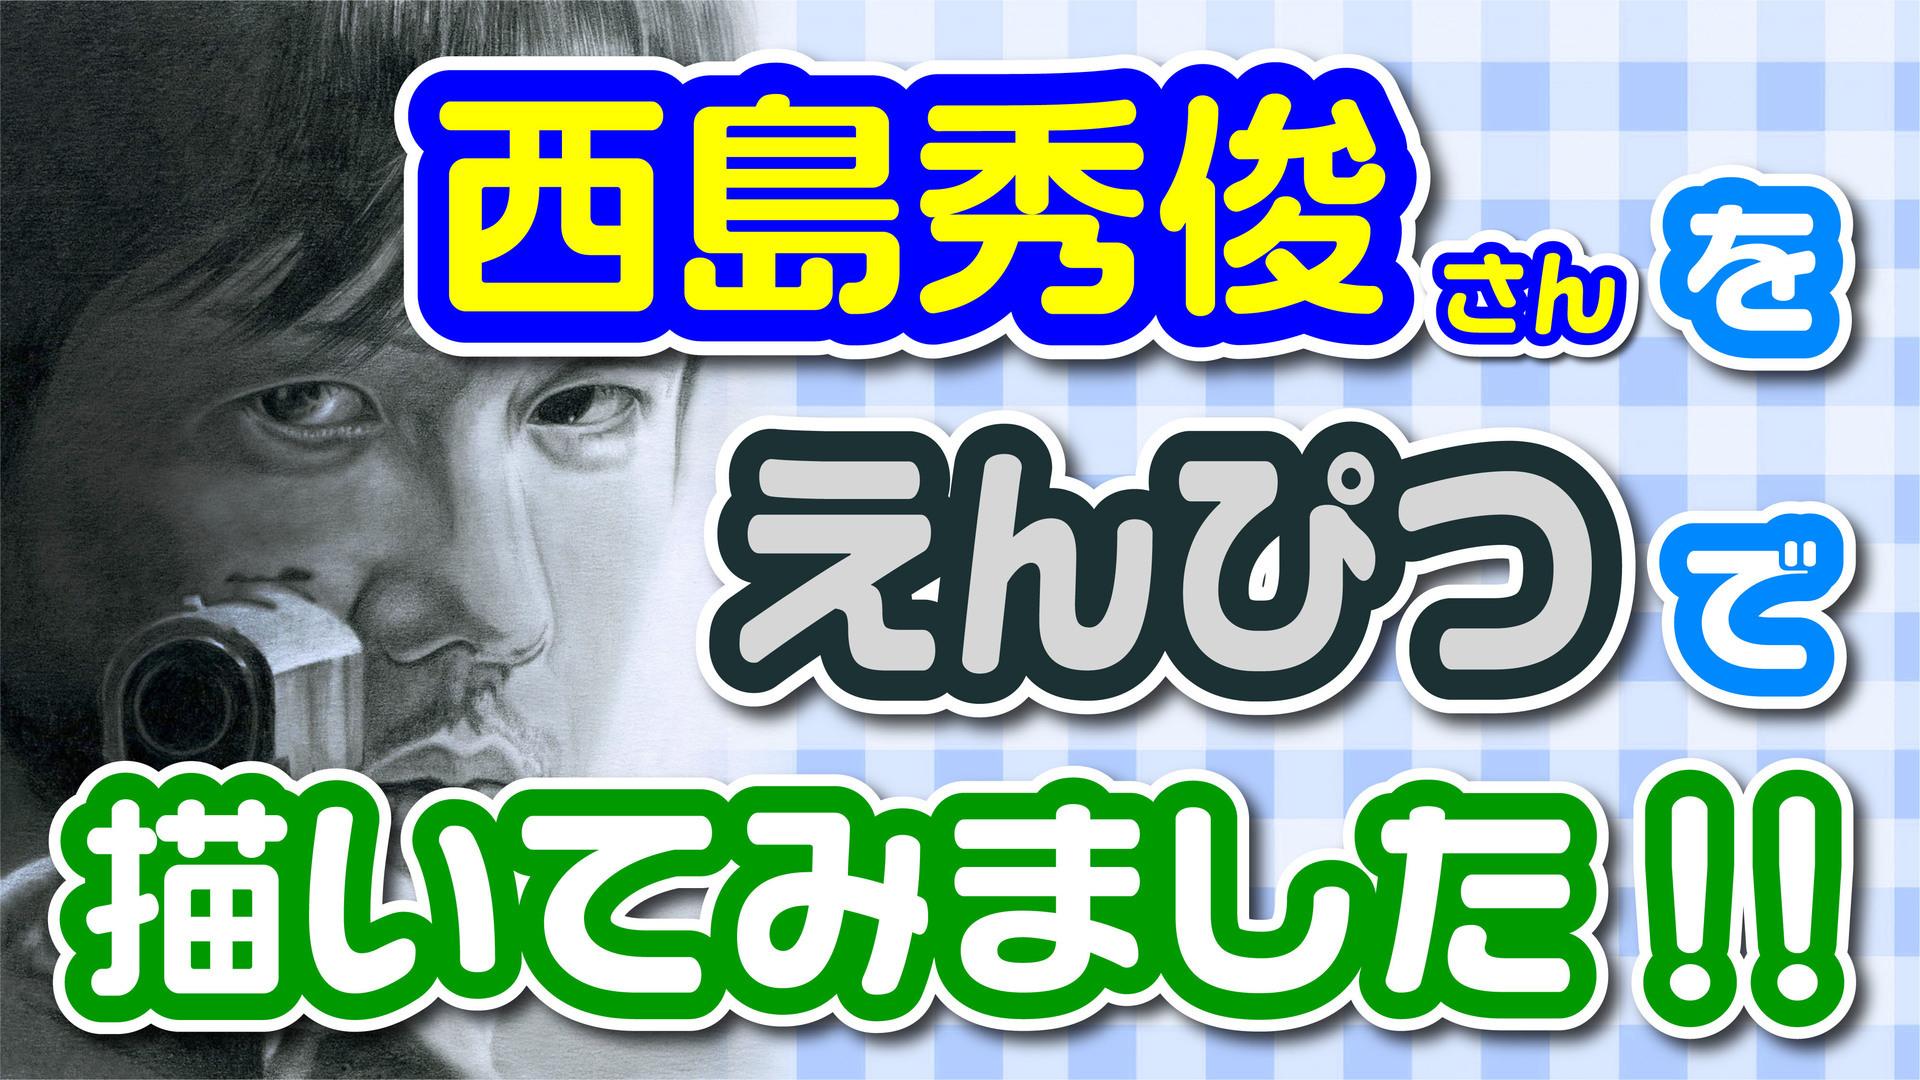 Youtubeサムネイル 西島秀俊鉛筆画.jpg